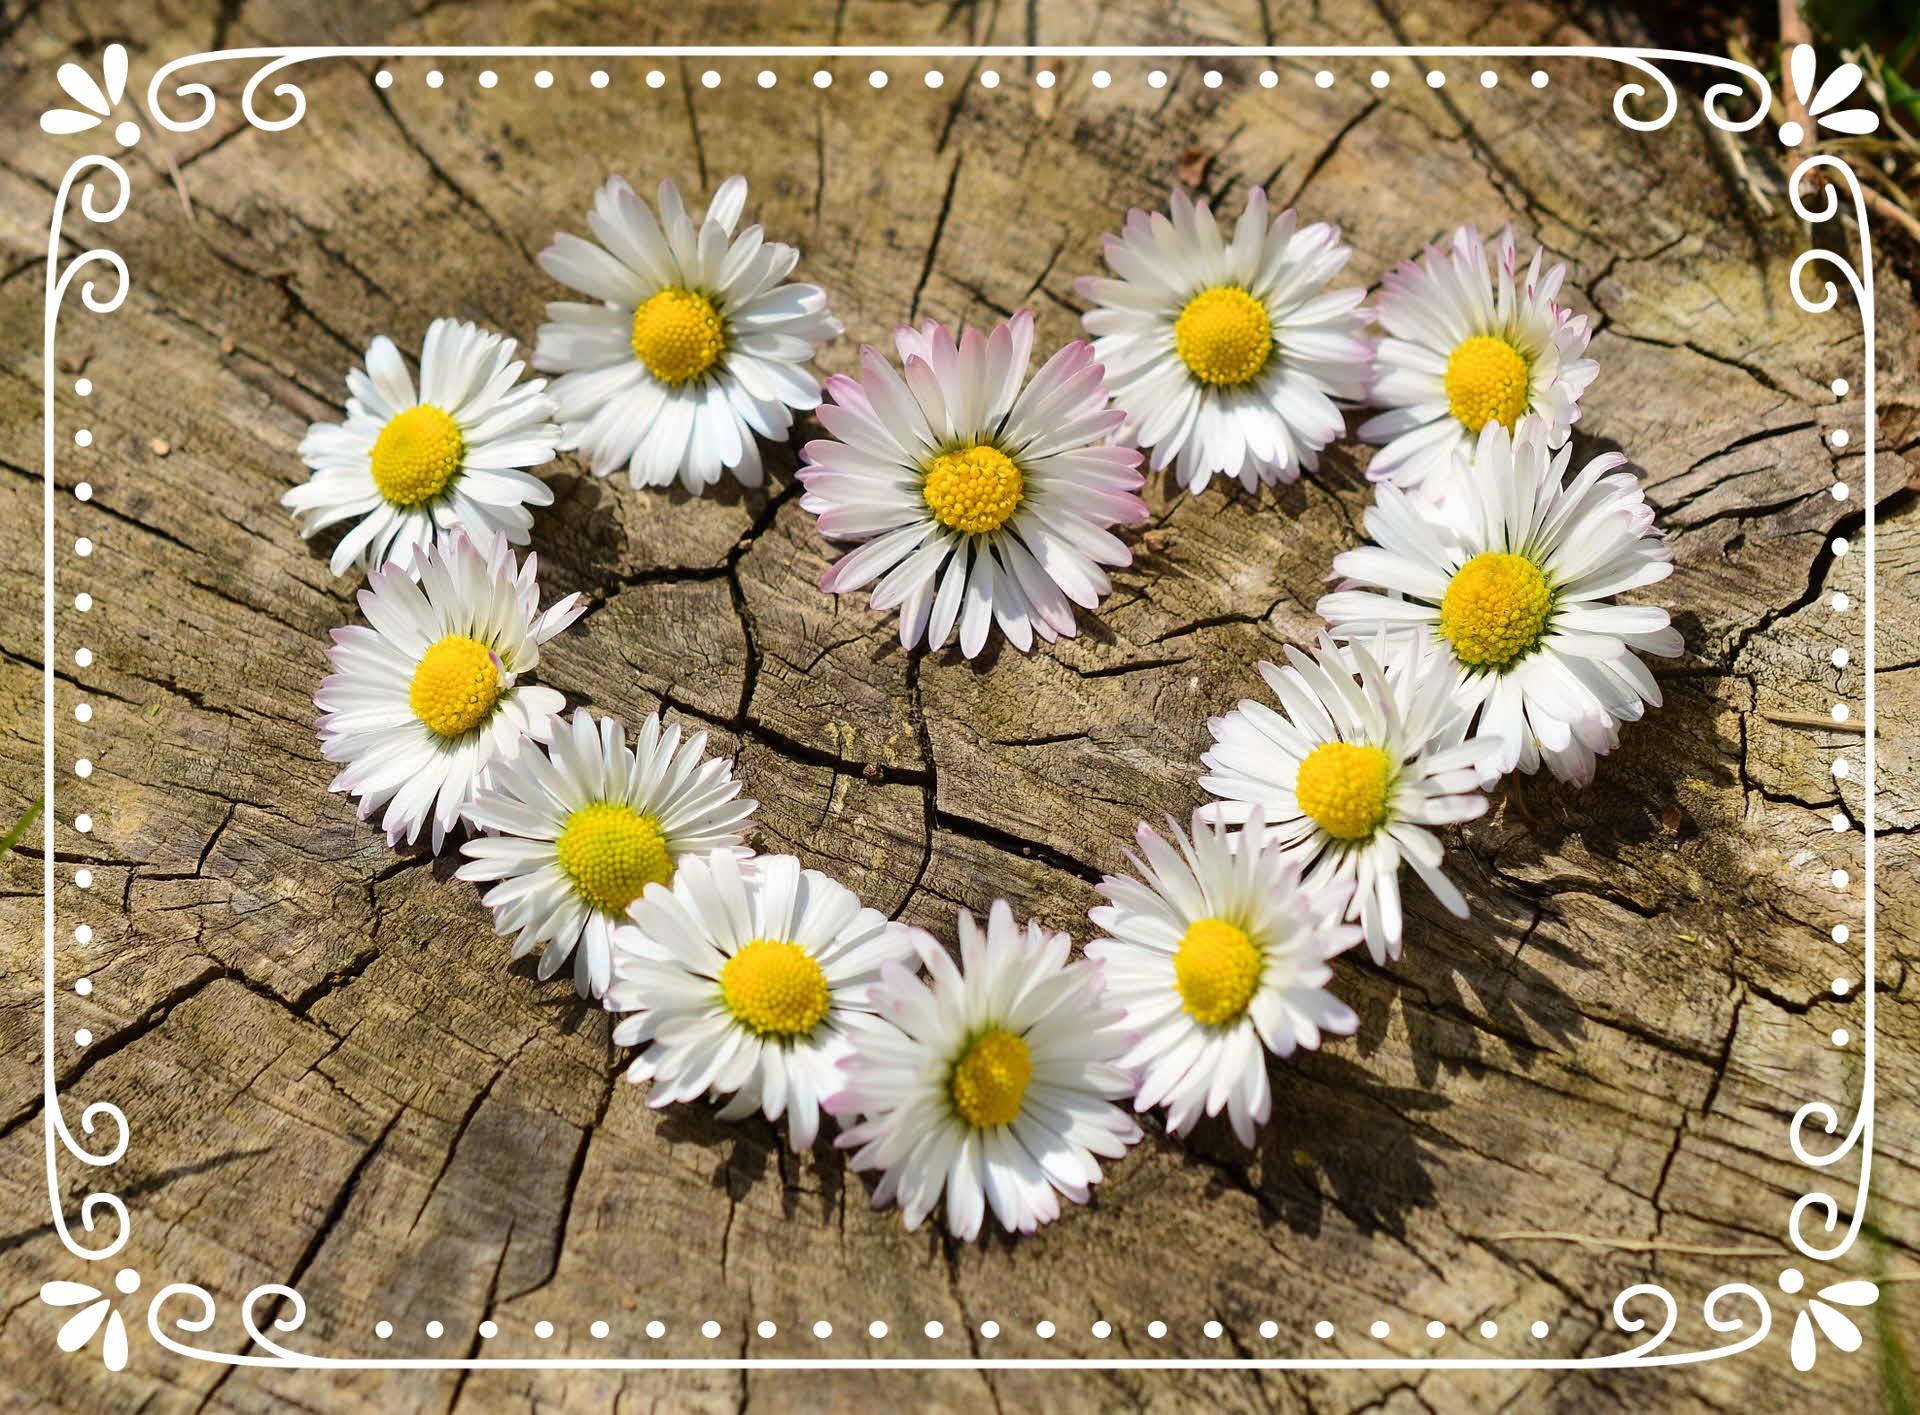 flower meaning comp.jpg